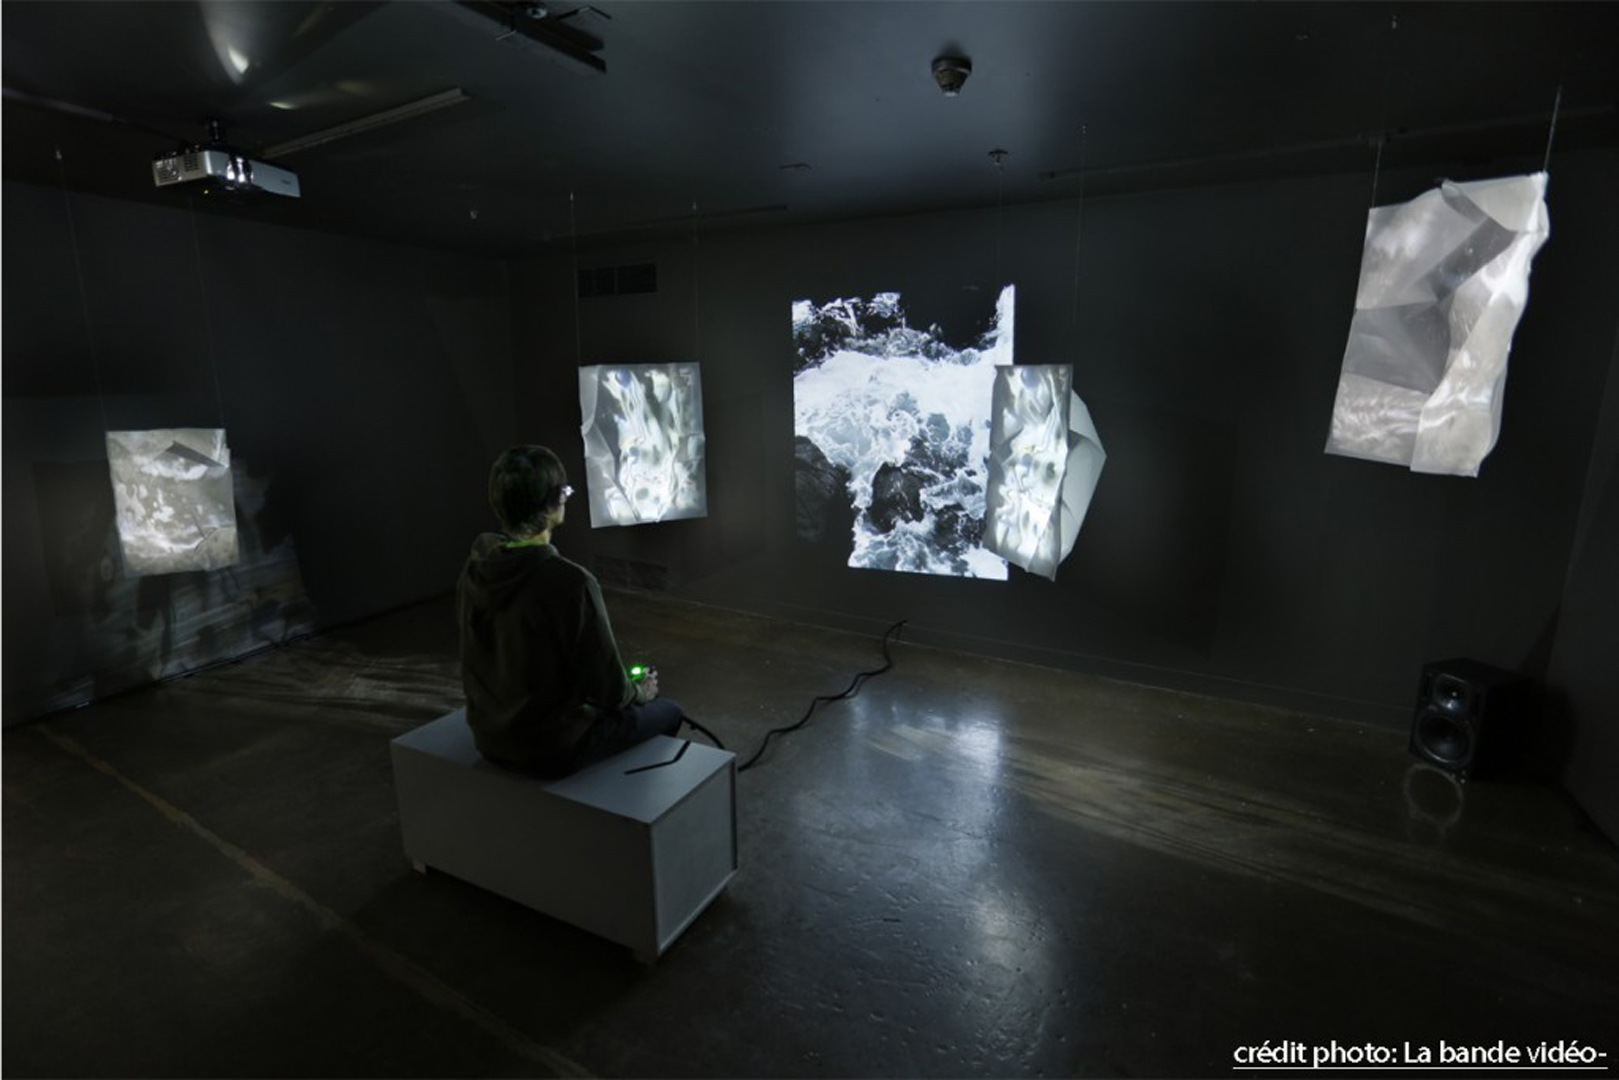 ©ISEA2015: 21st International Symposium on Electronic Art, Cynthia Naggar, They watched the sea! (ils ont regardé la mer!)